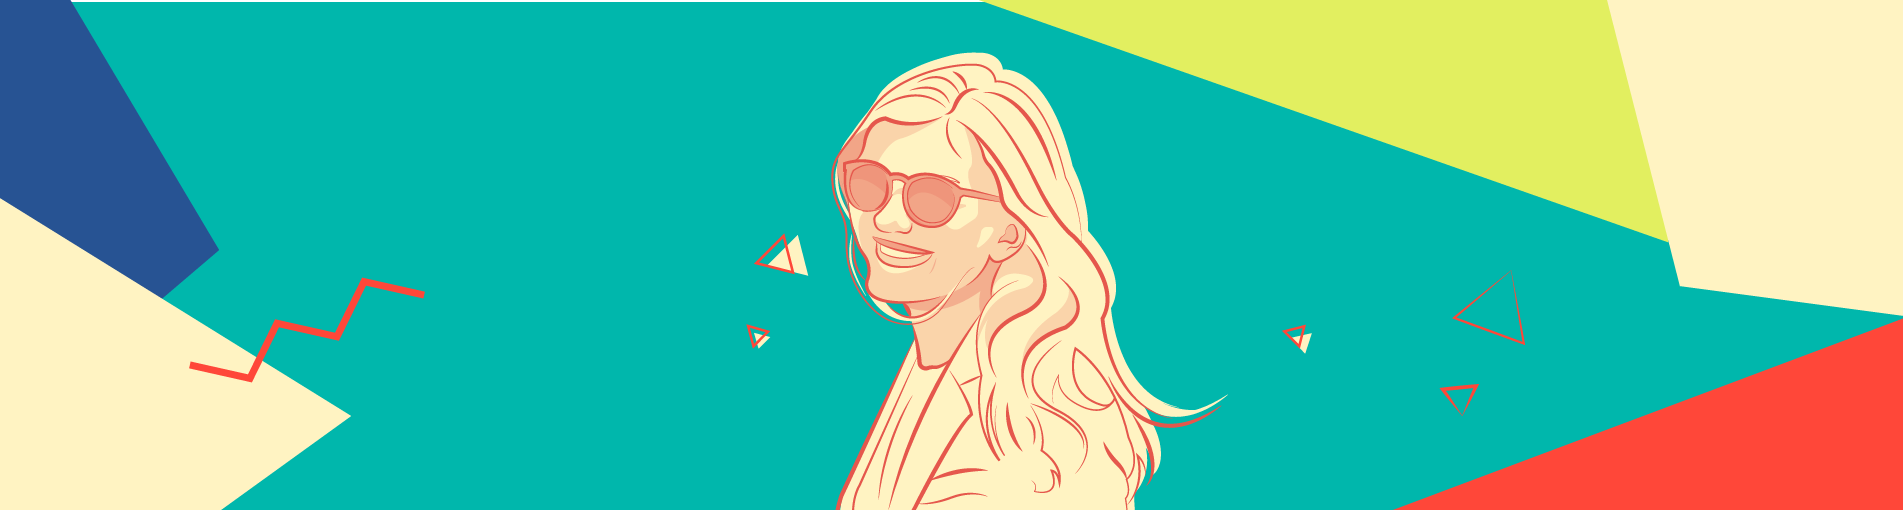 Interview with Olena Miliutina UX Designer at Google